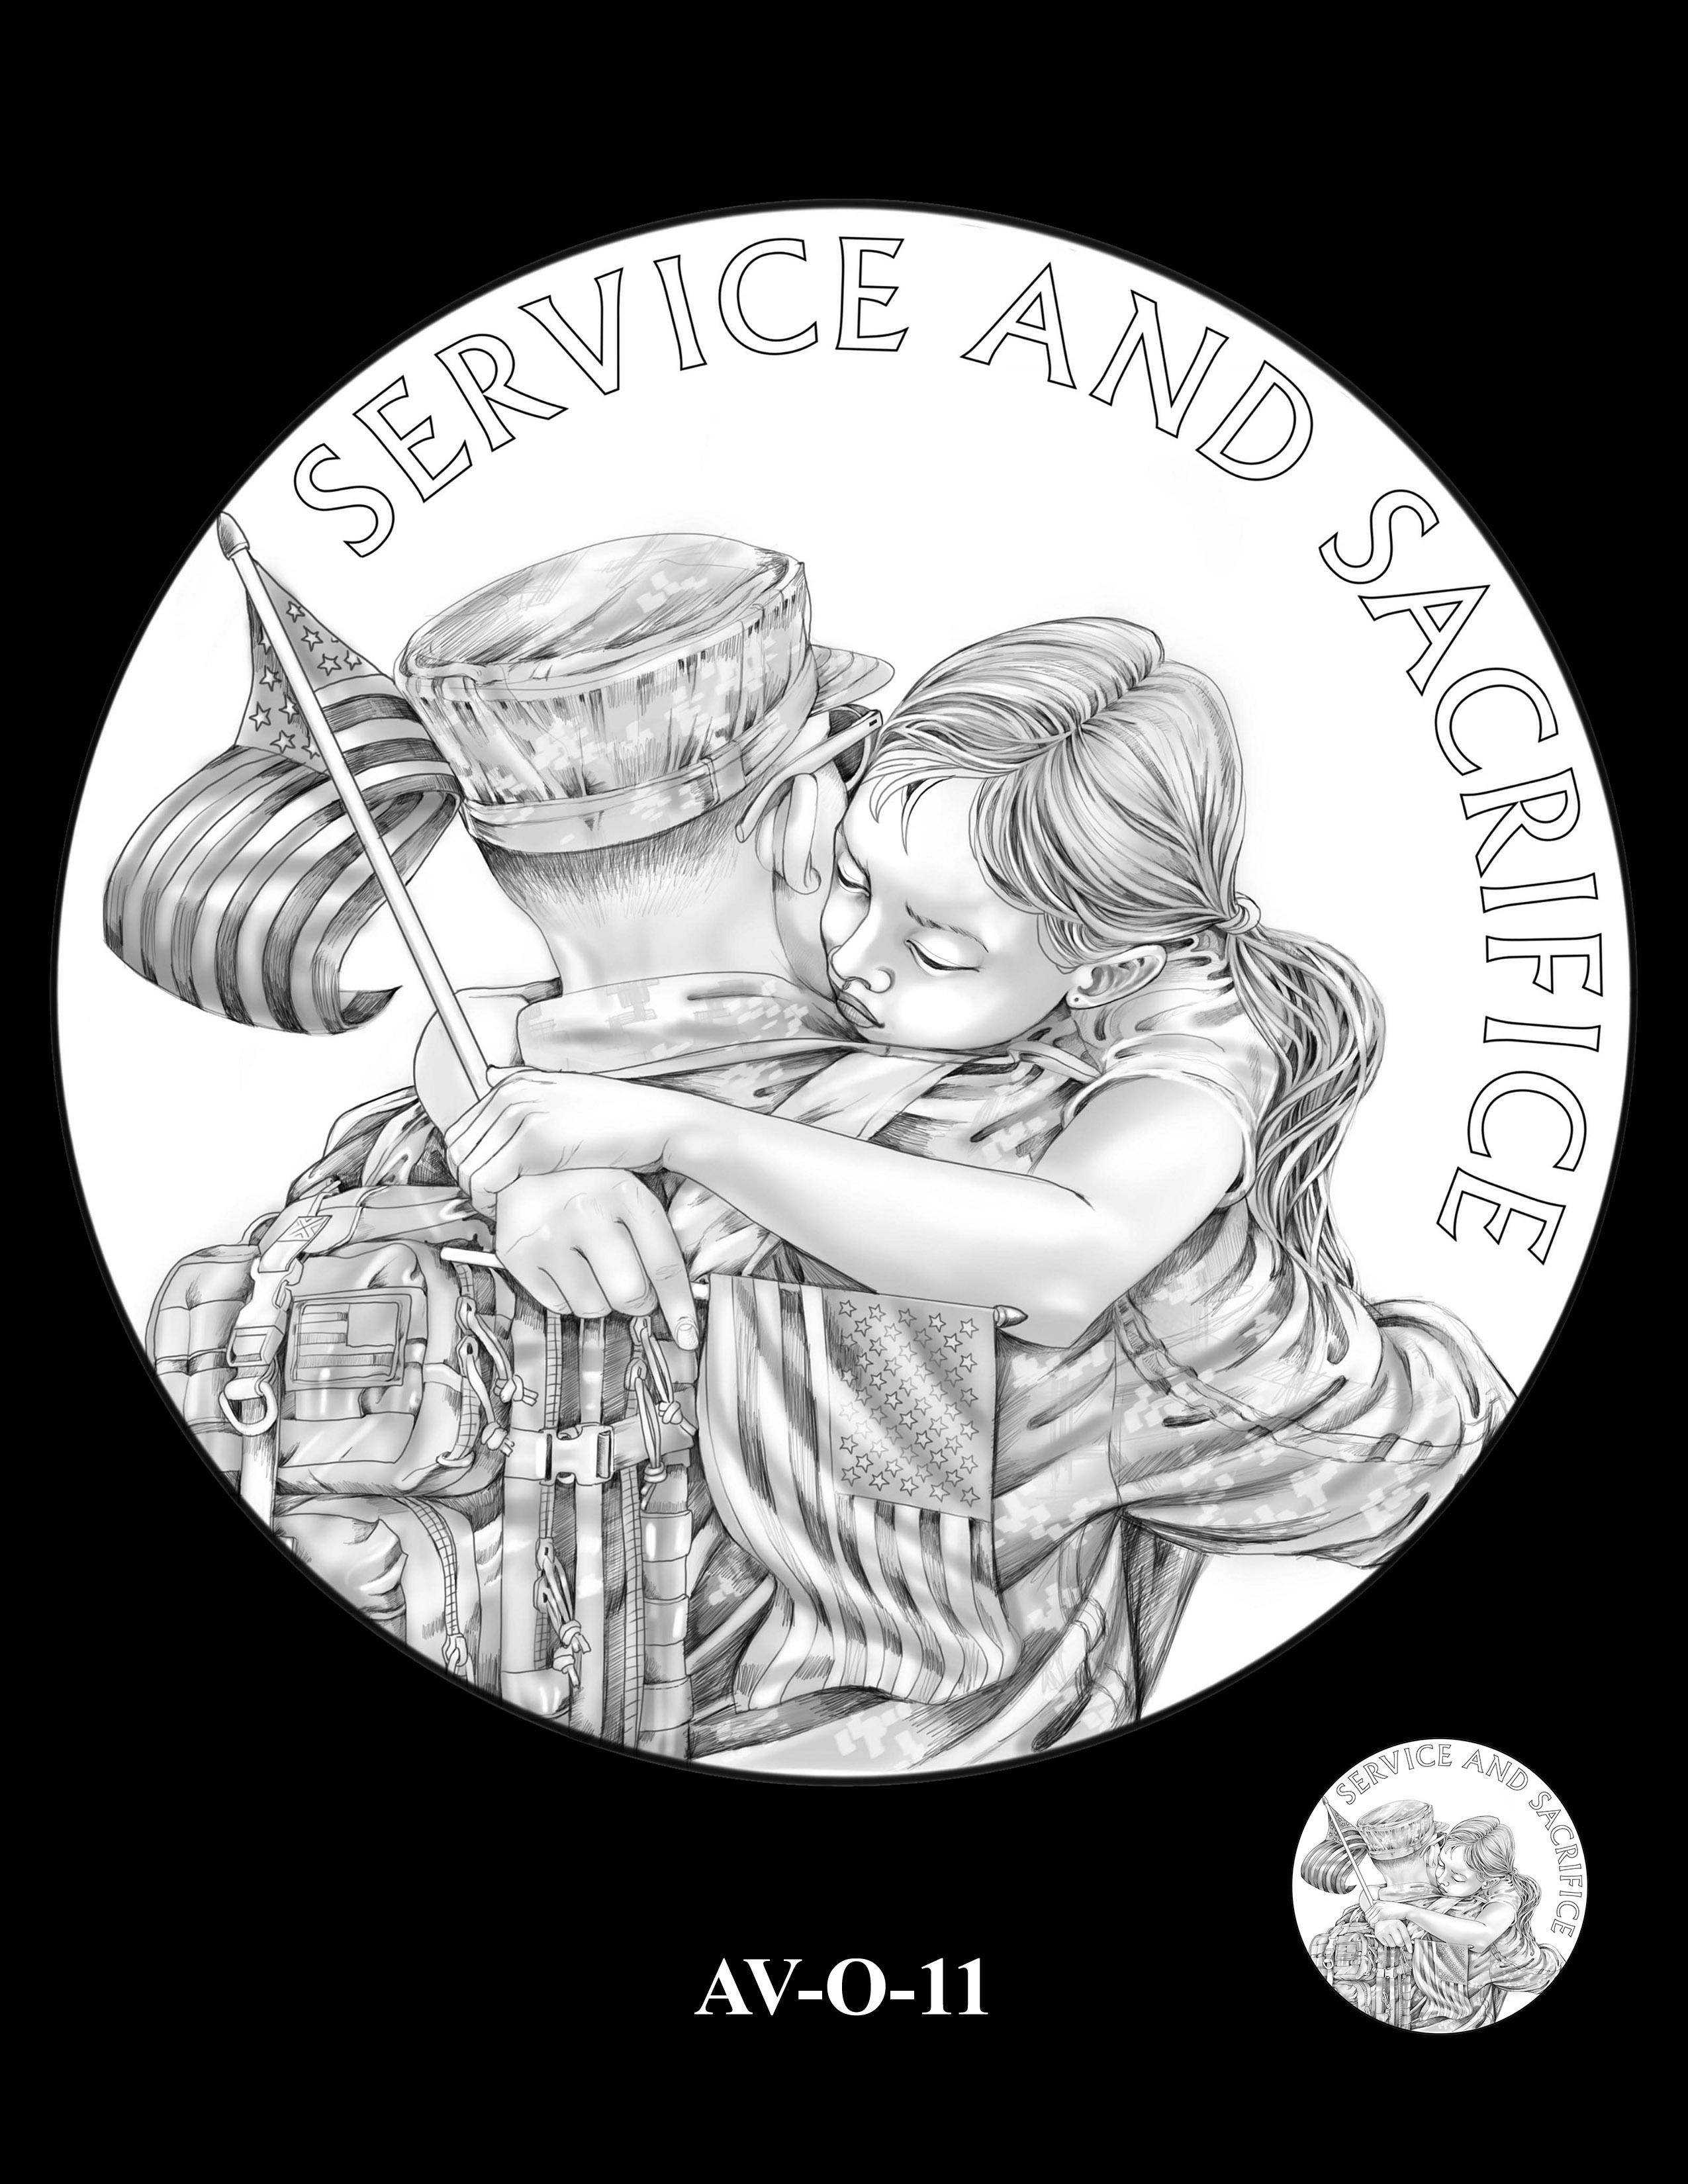 AV-O-11 - American Veterans Medal